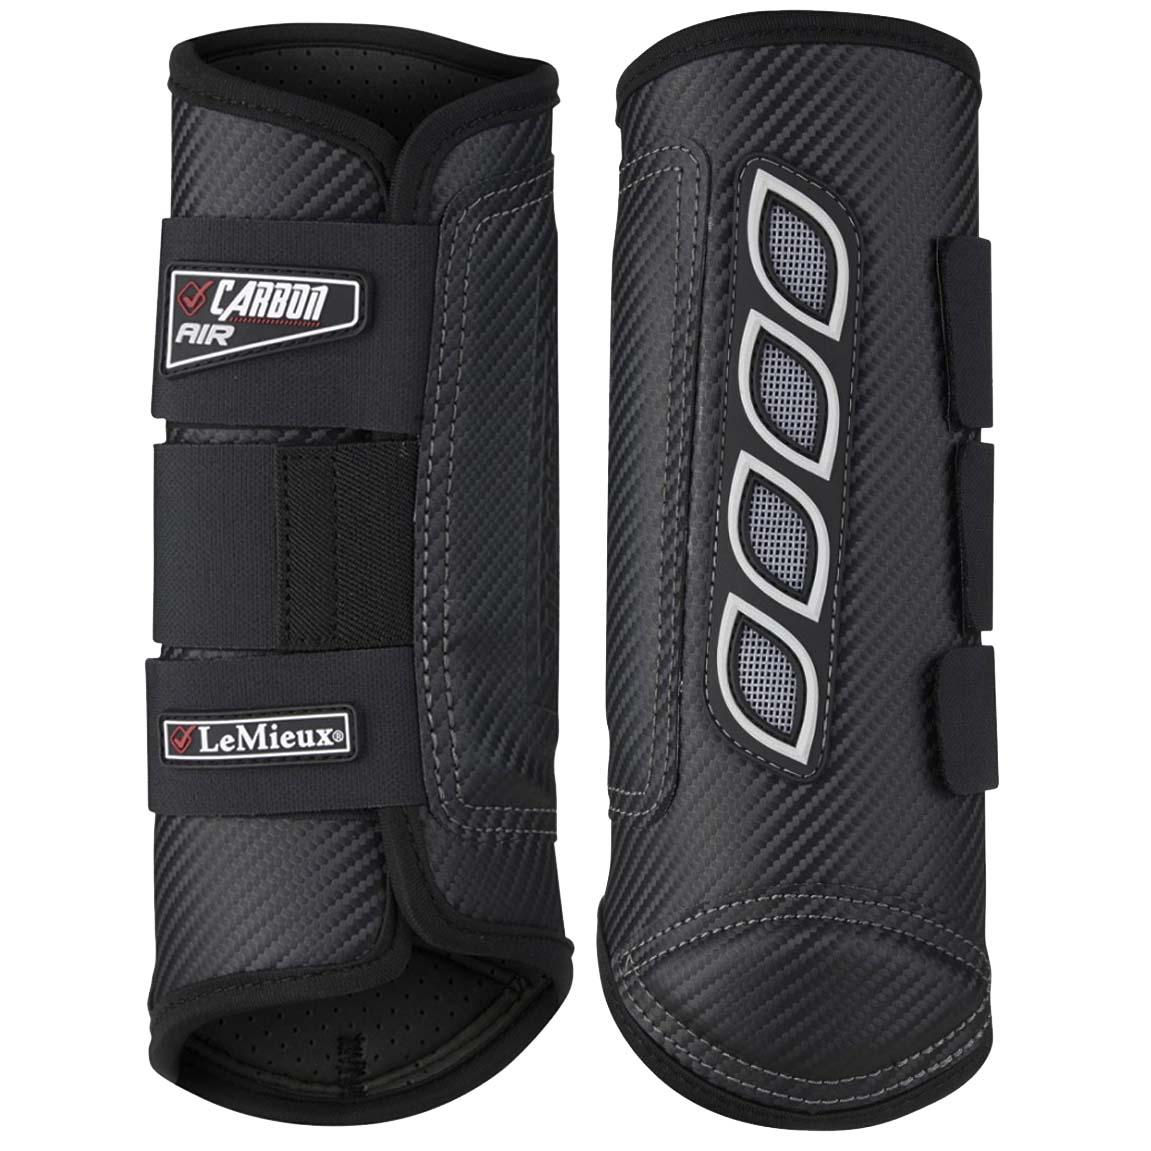 Le Mieux Carbon Air XC boots hind zwart maat:l